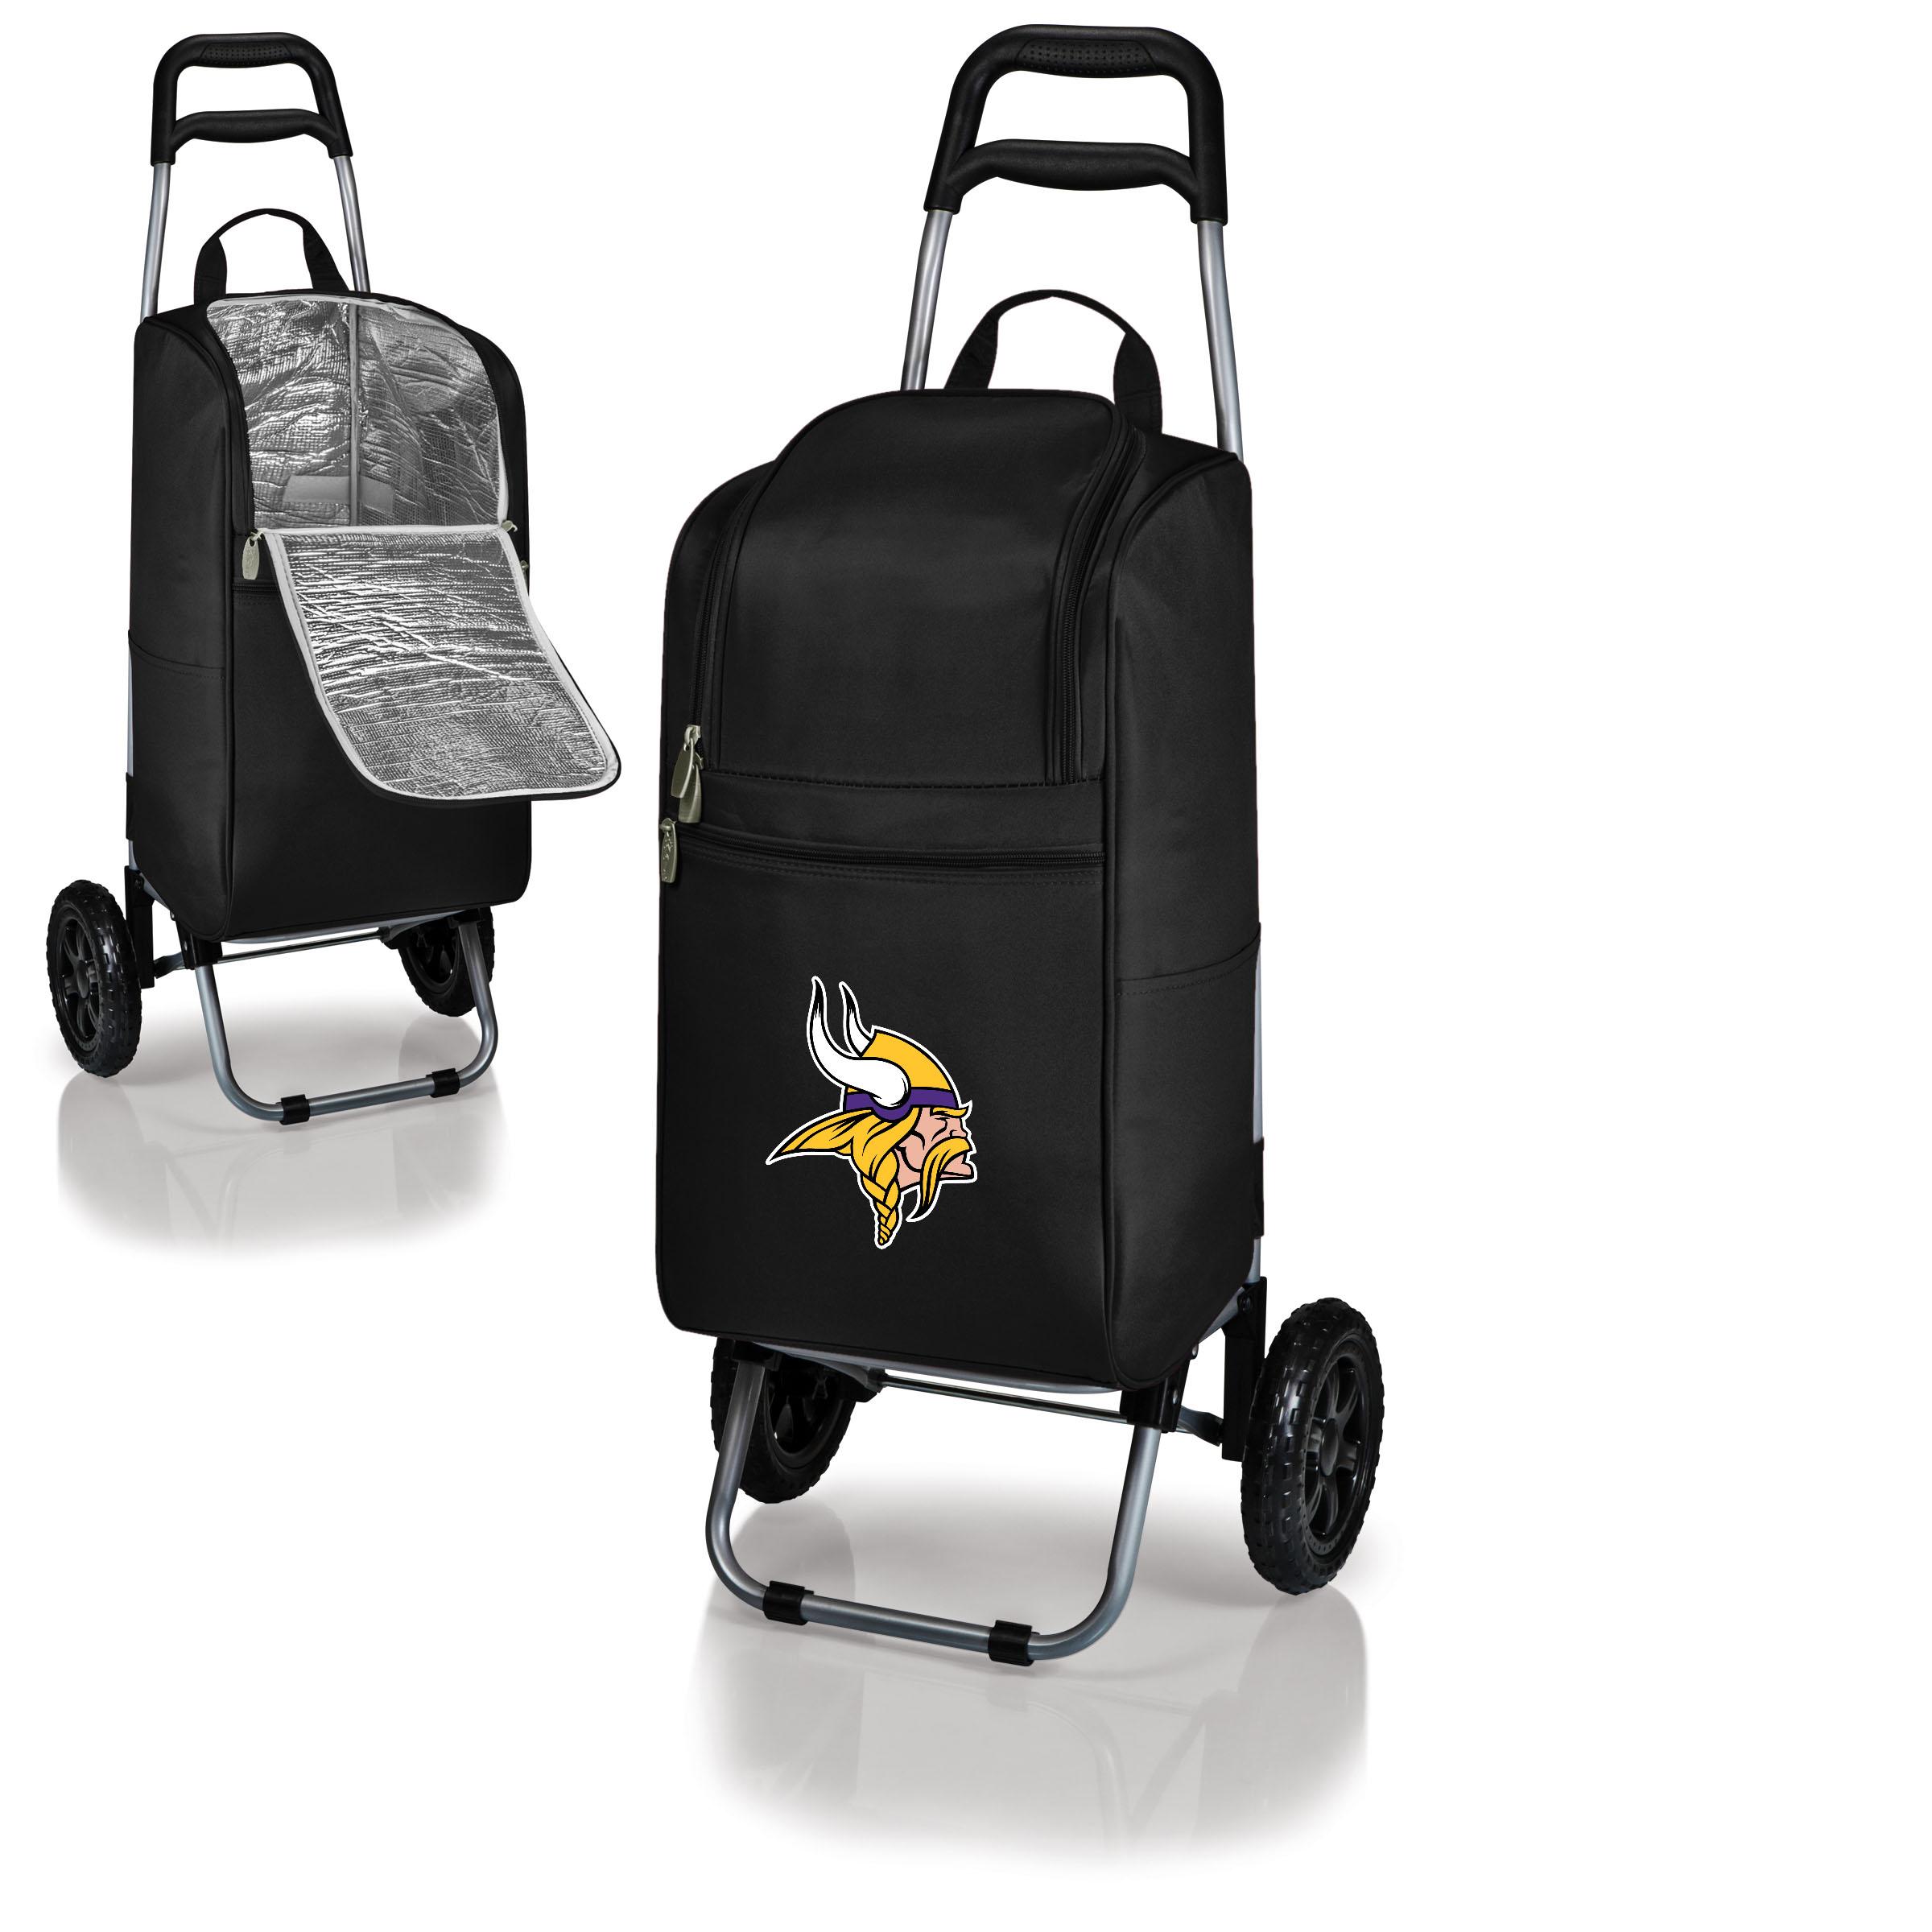 Minnesota Vikings Cart Cooler - Black - No Size